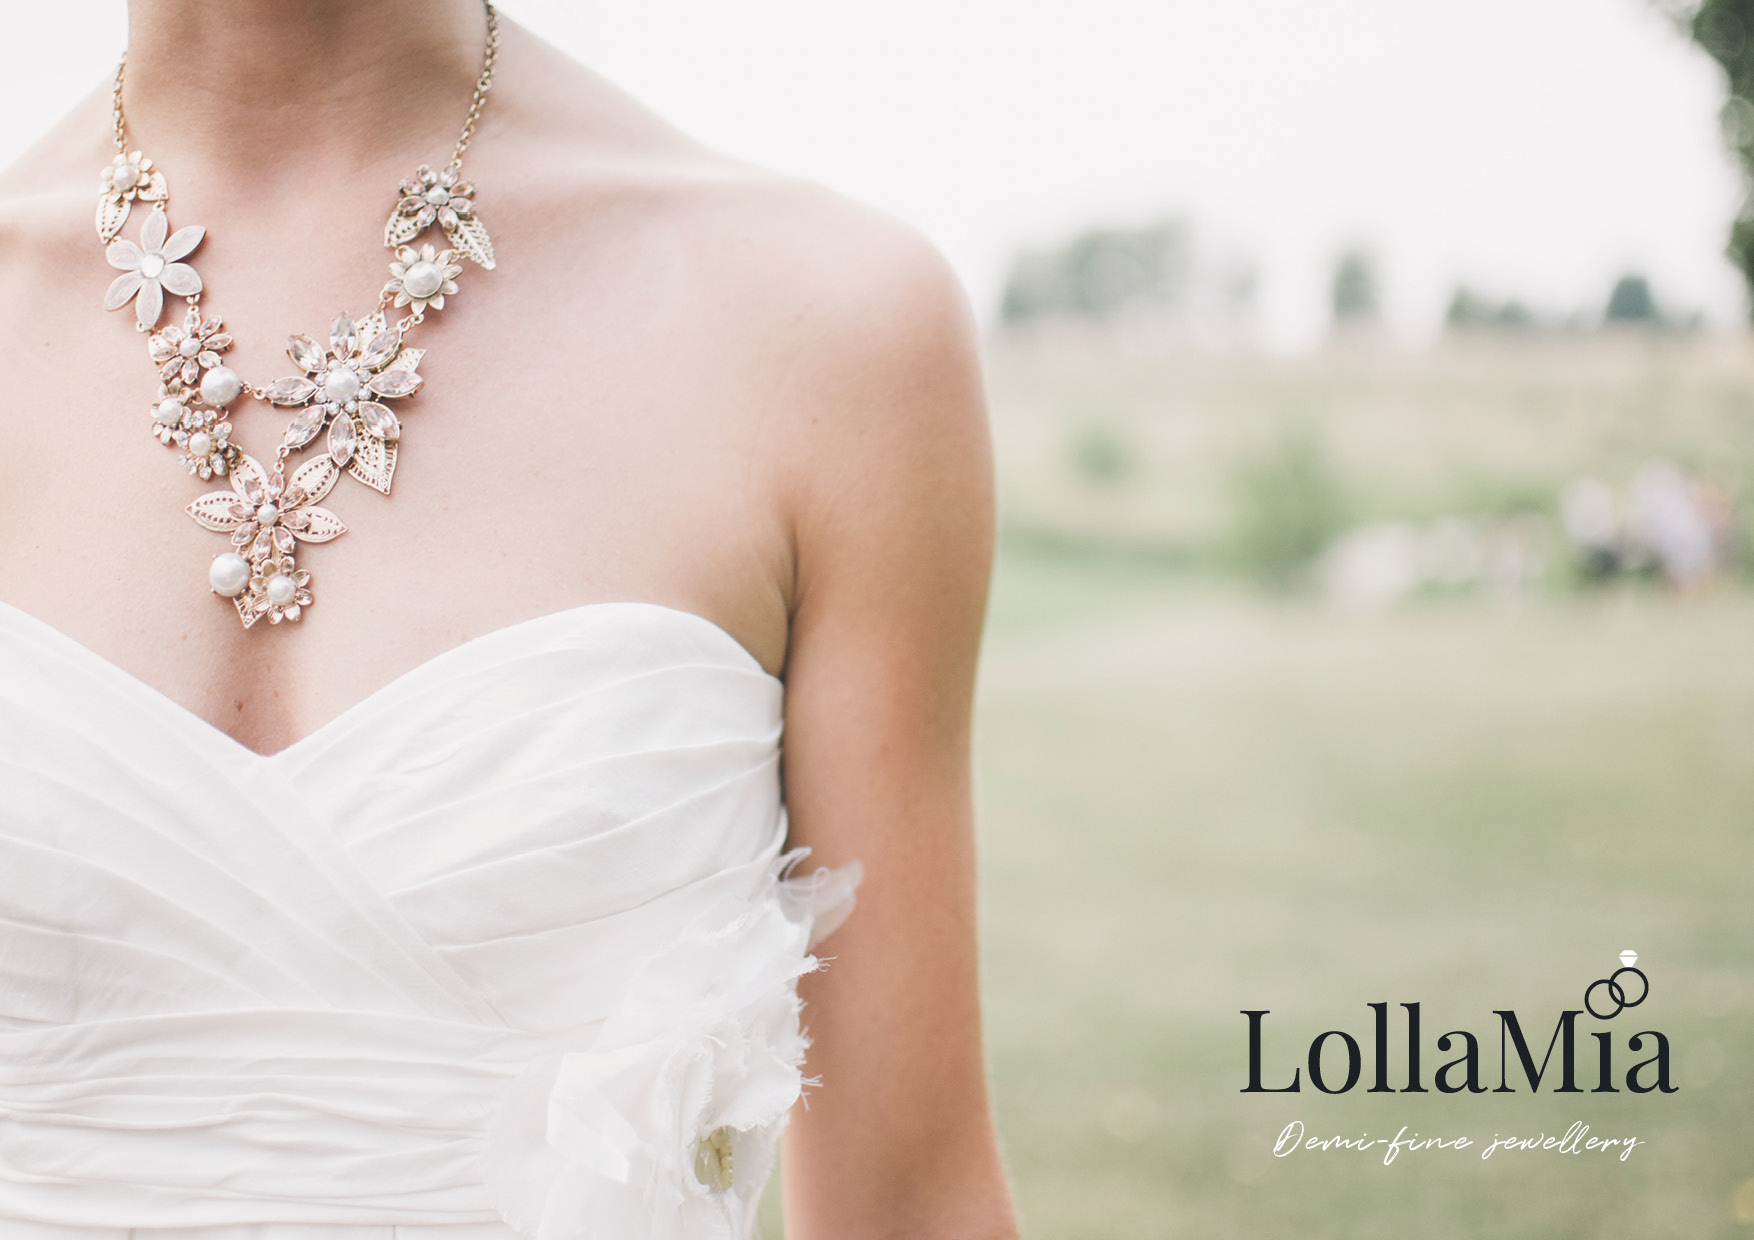 Lolla Mia Logo/Brand Creation | Logo Concept Diamond Cut